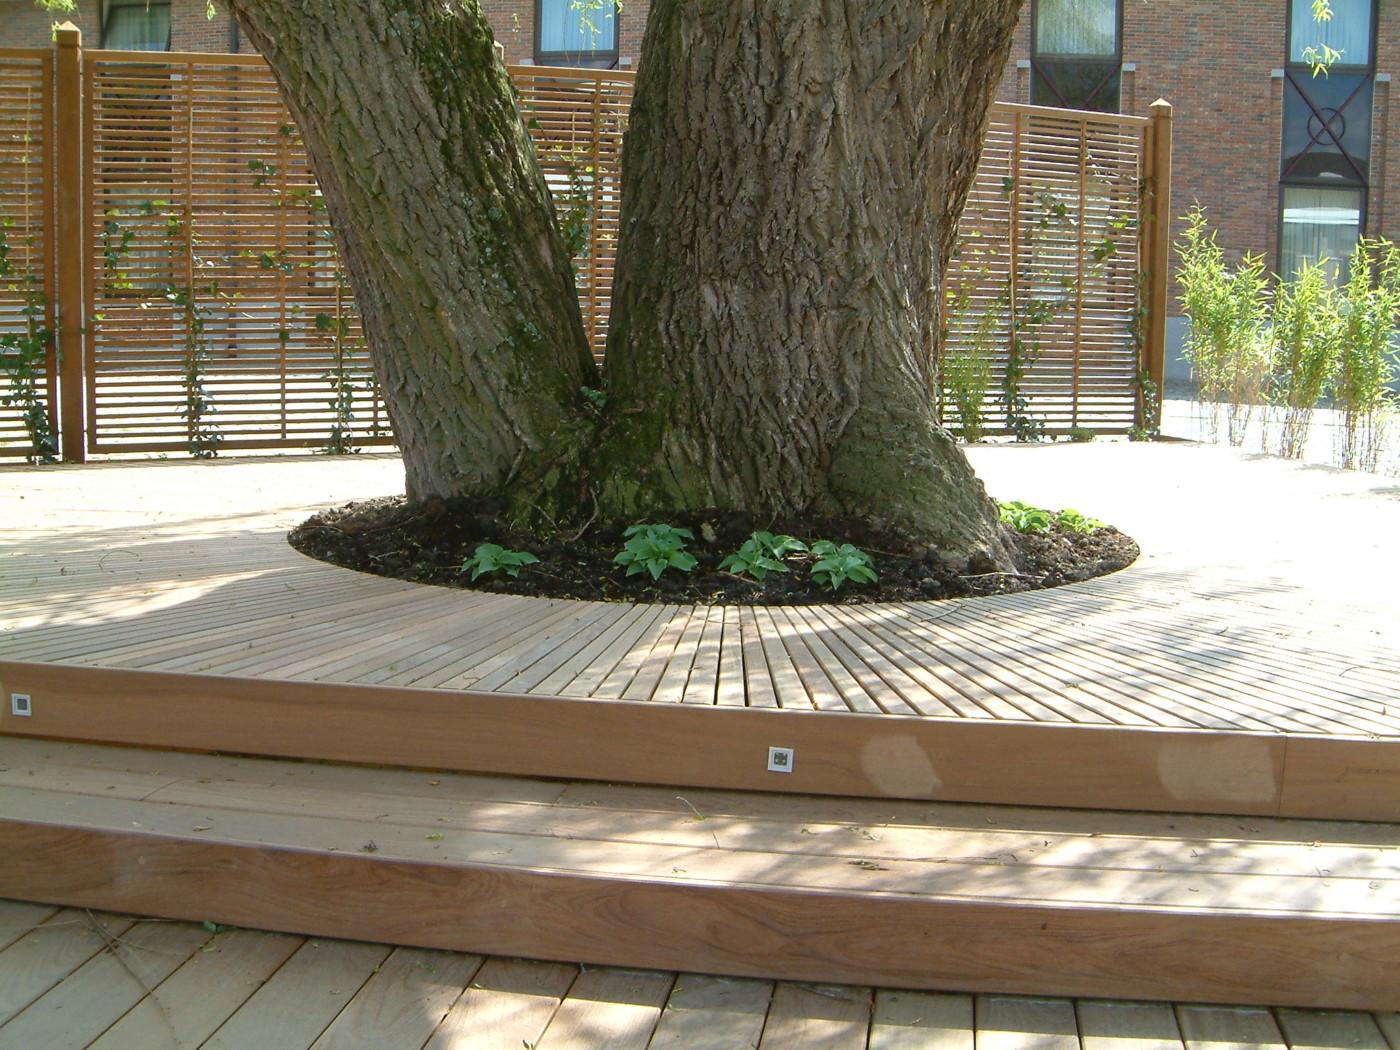 terrasse sur mesure arrondie int grant un arbre limal mt design. Black Bedroom Furniture Sets. Home Design Ideas